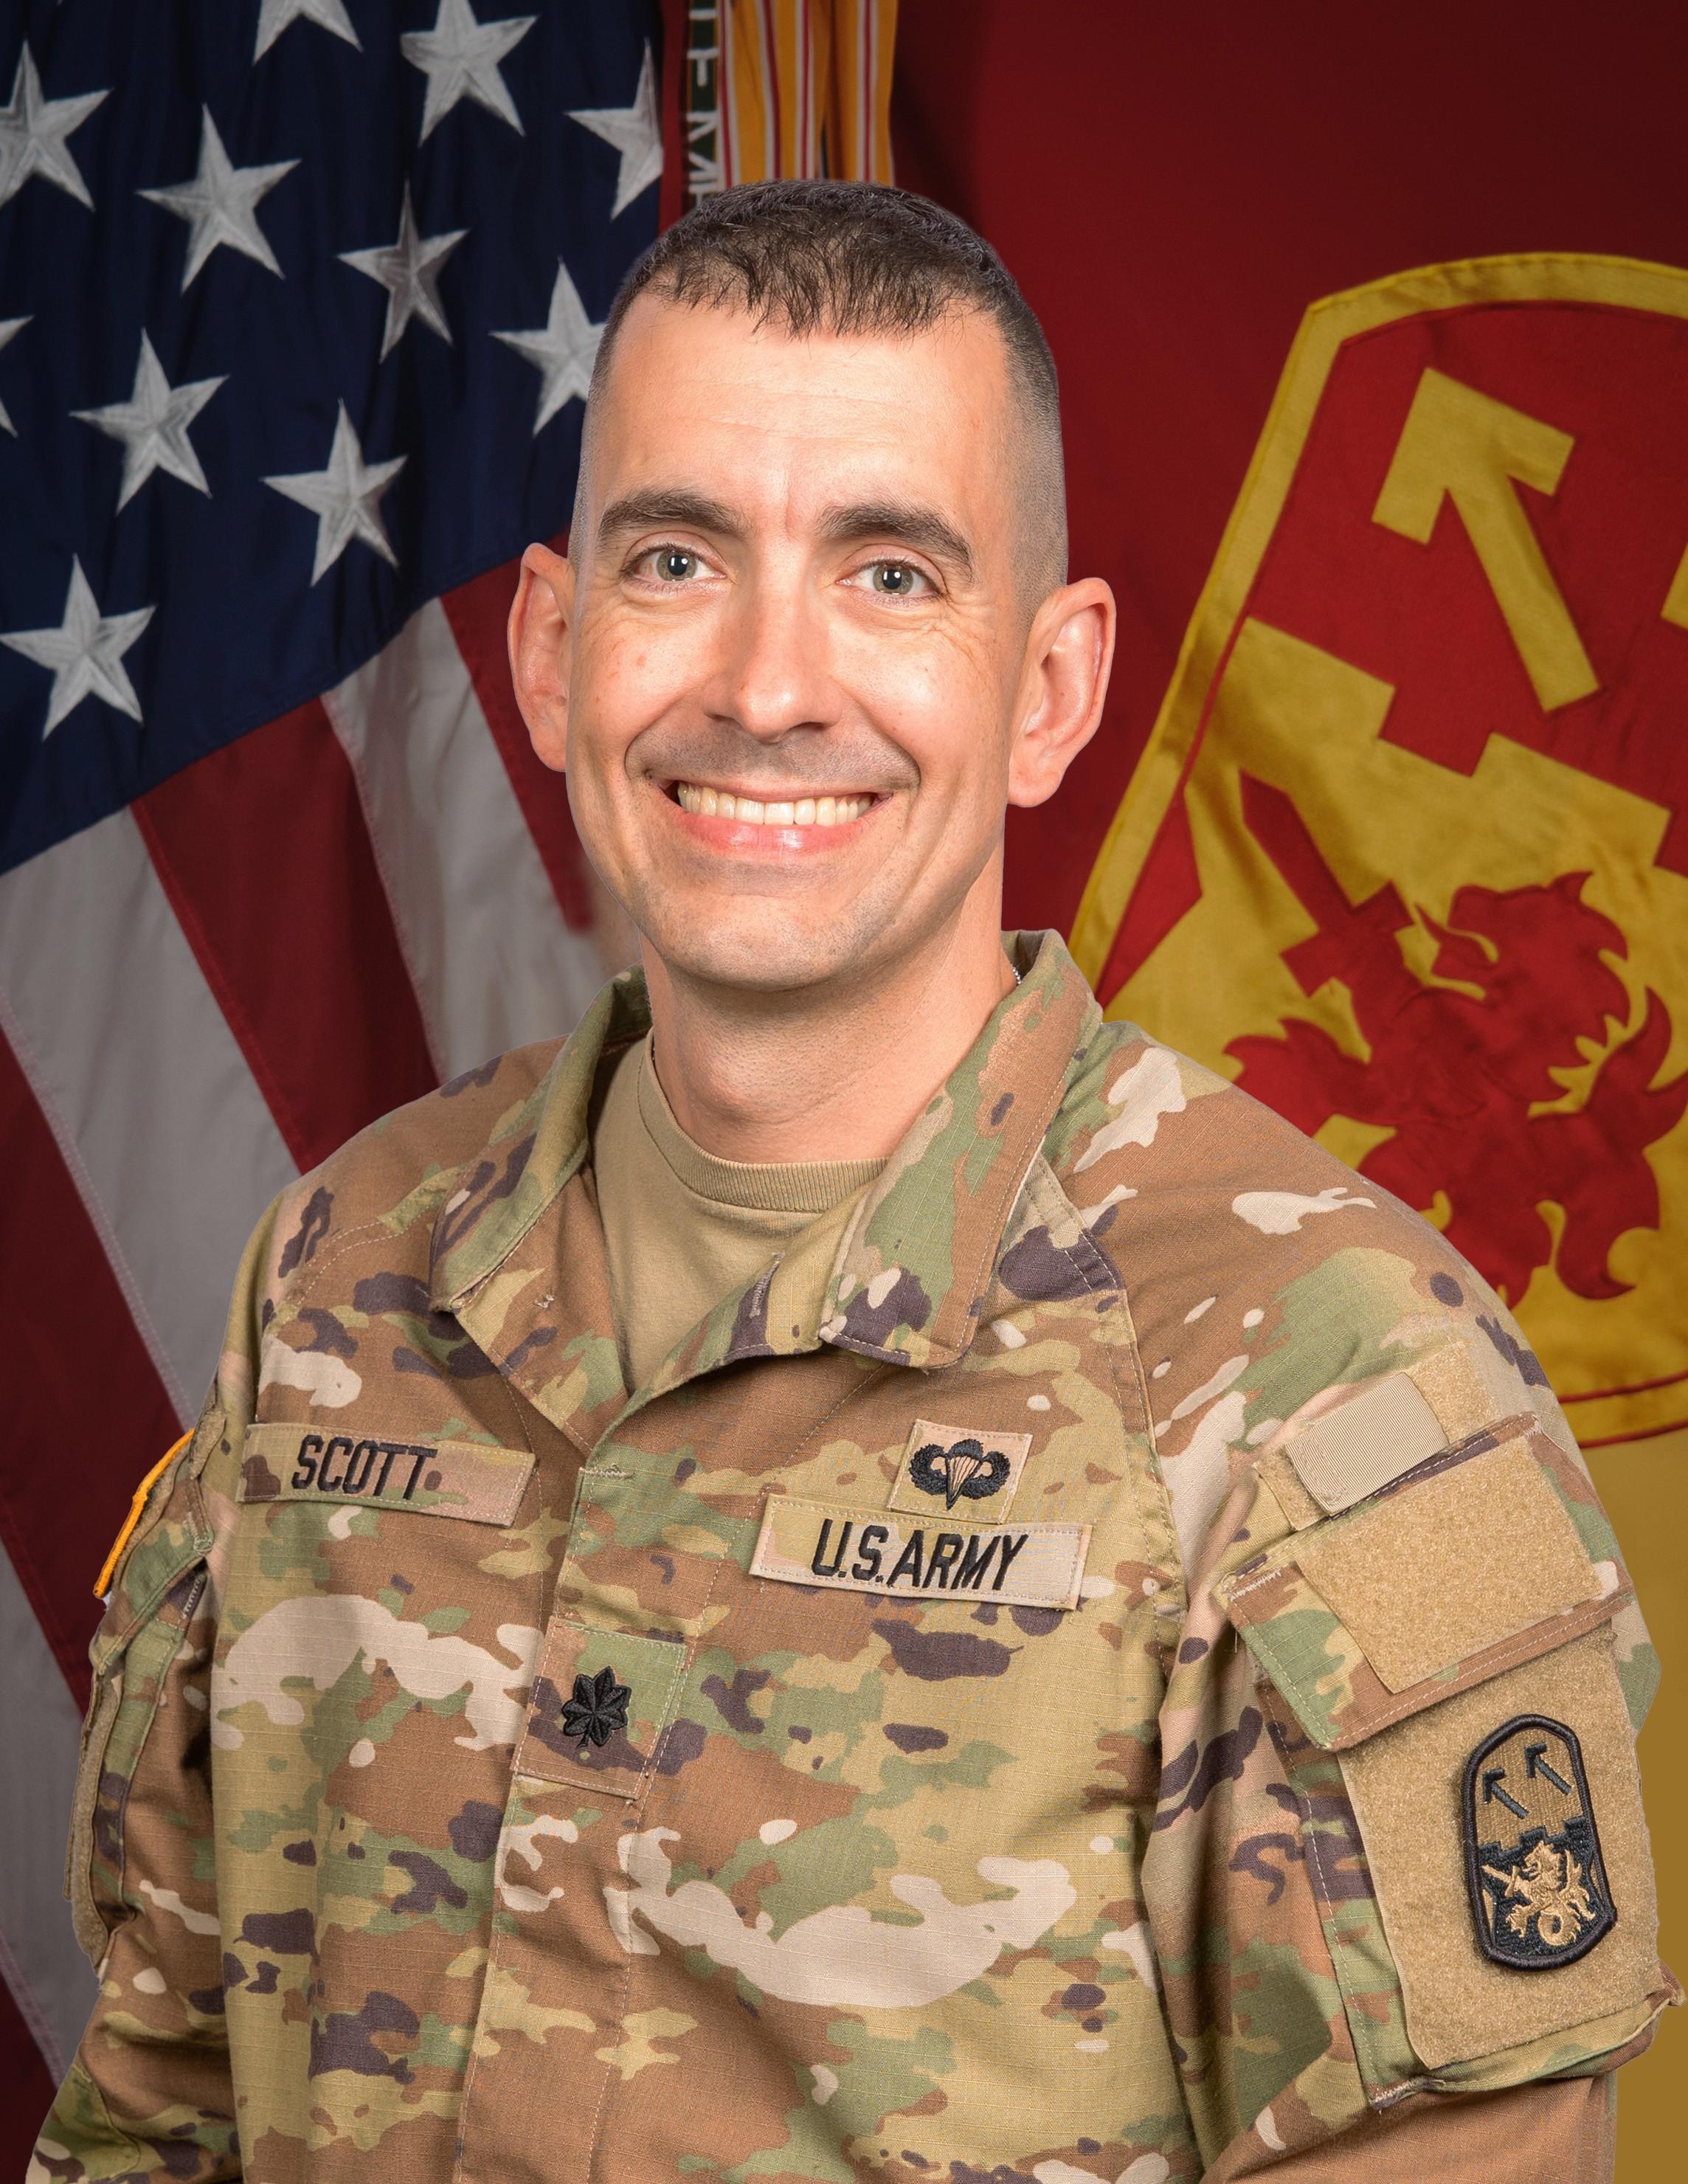 Lt. Col. Joseph Scott